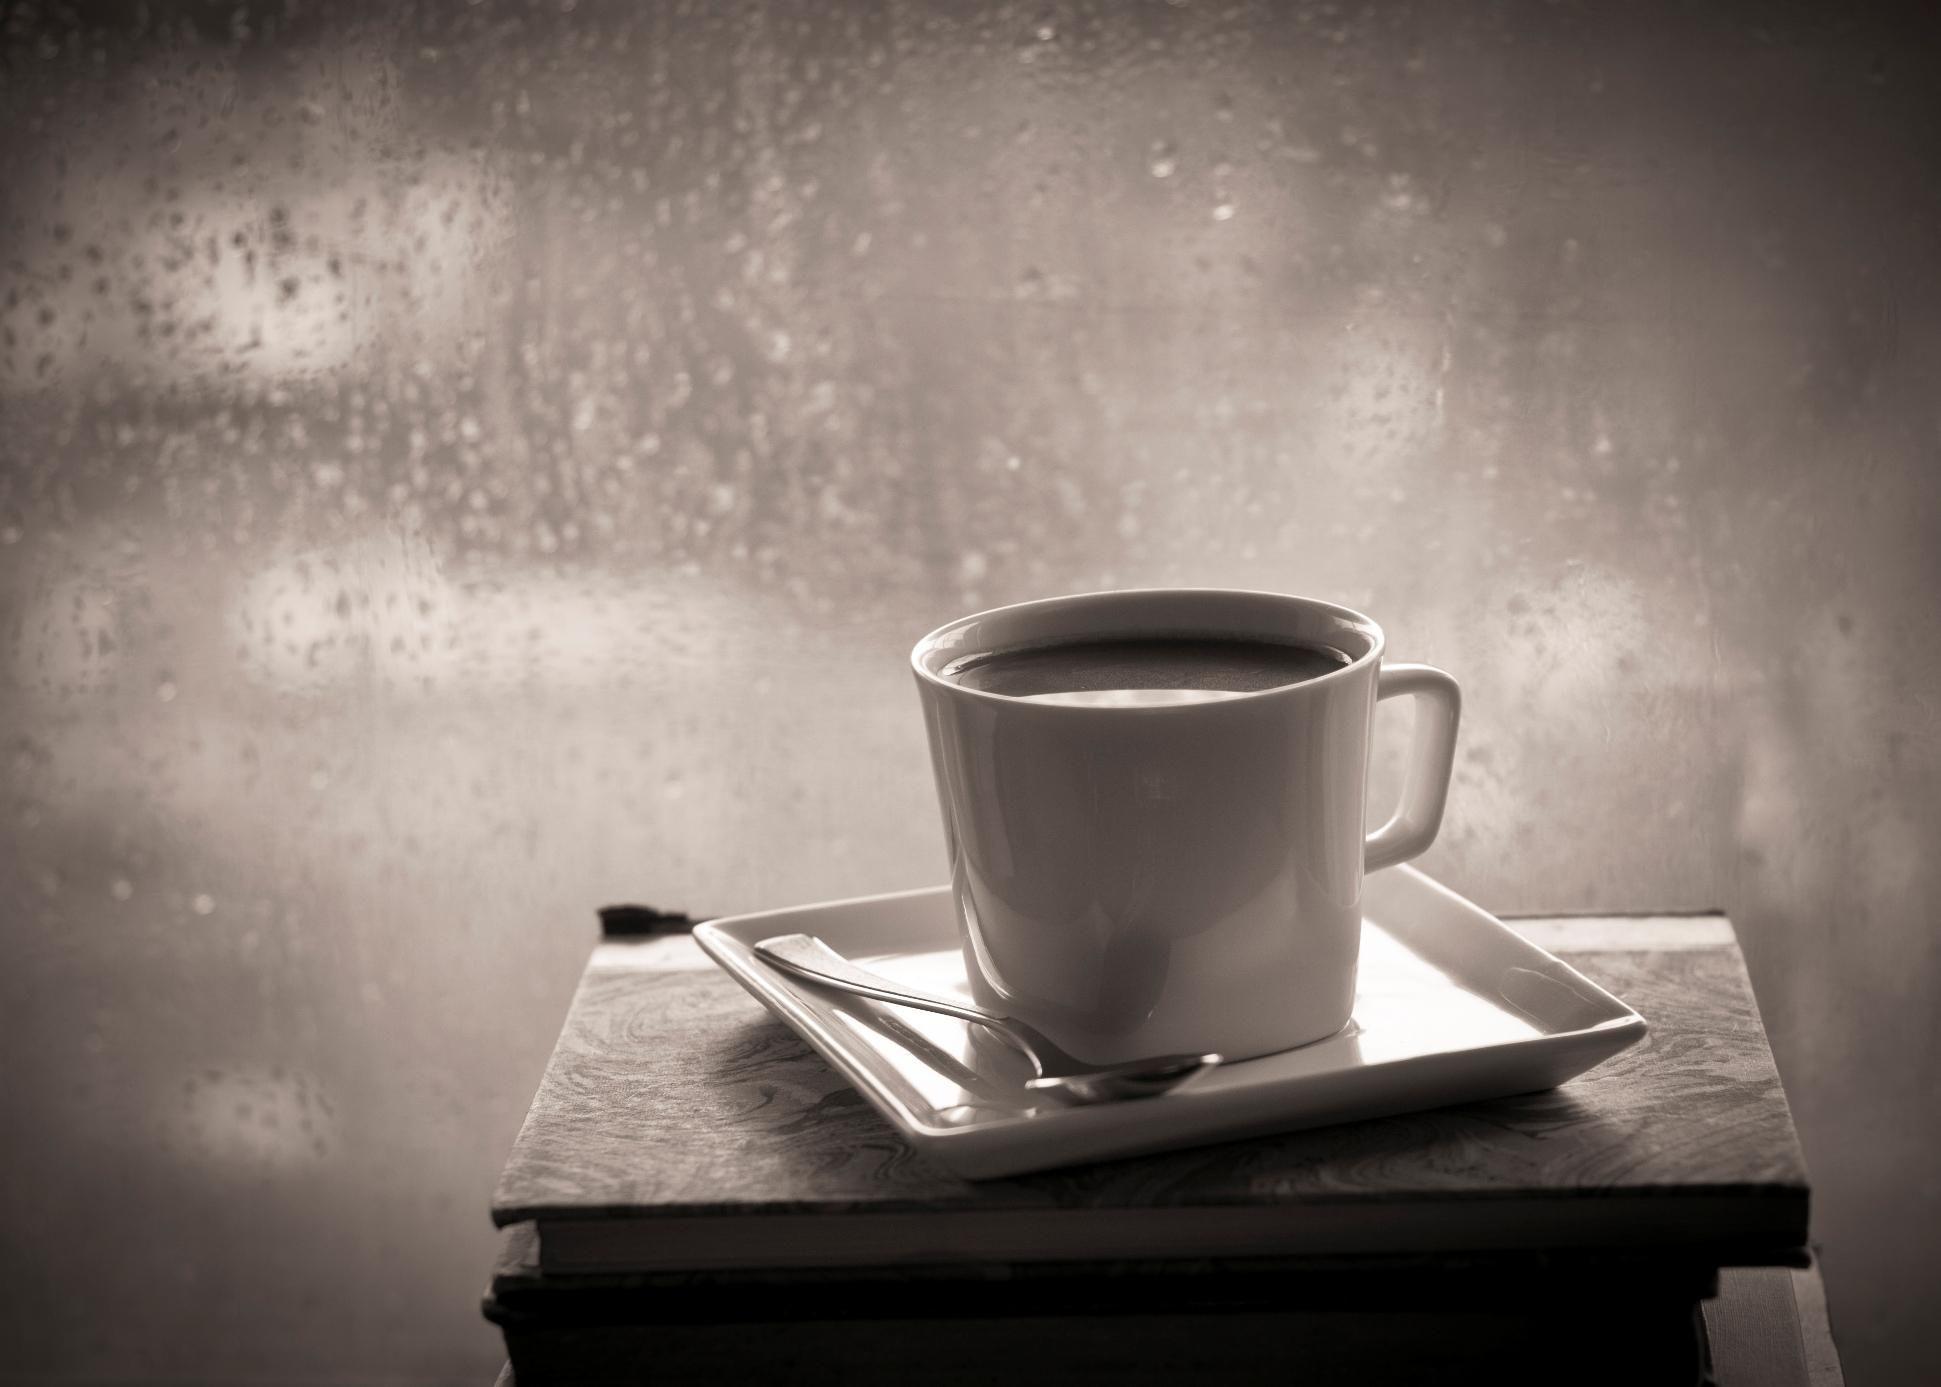 Coffee on a rainy day........ I love a rainy day